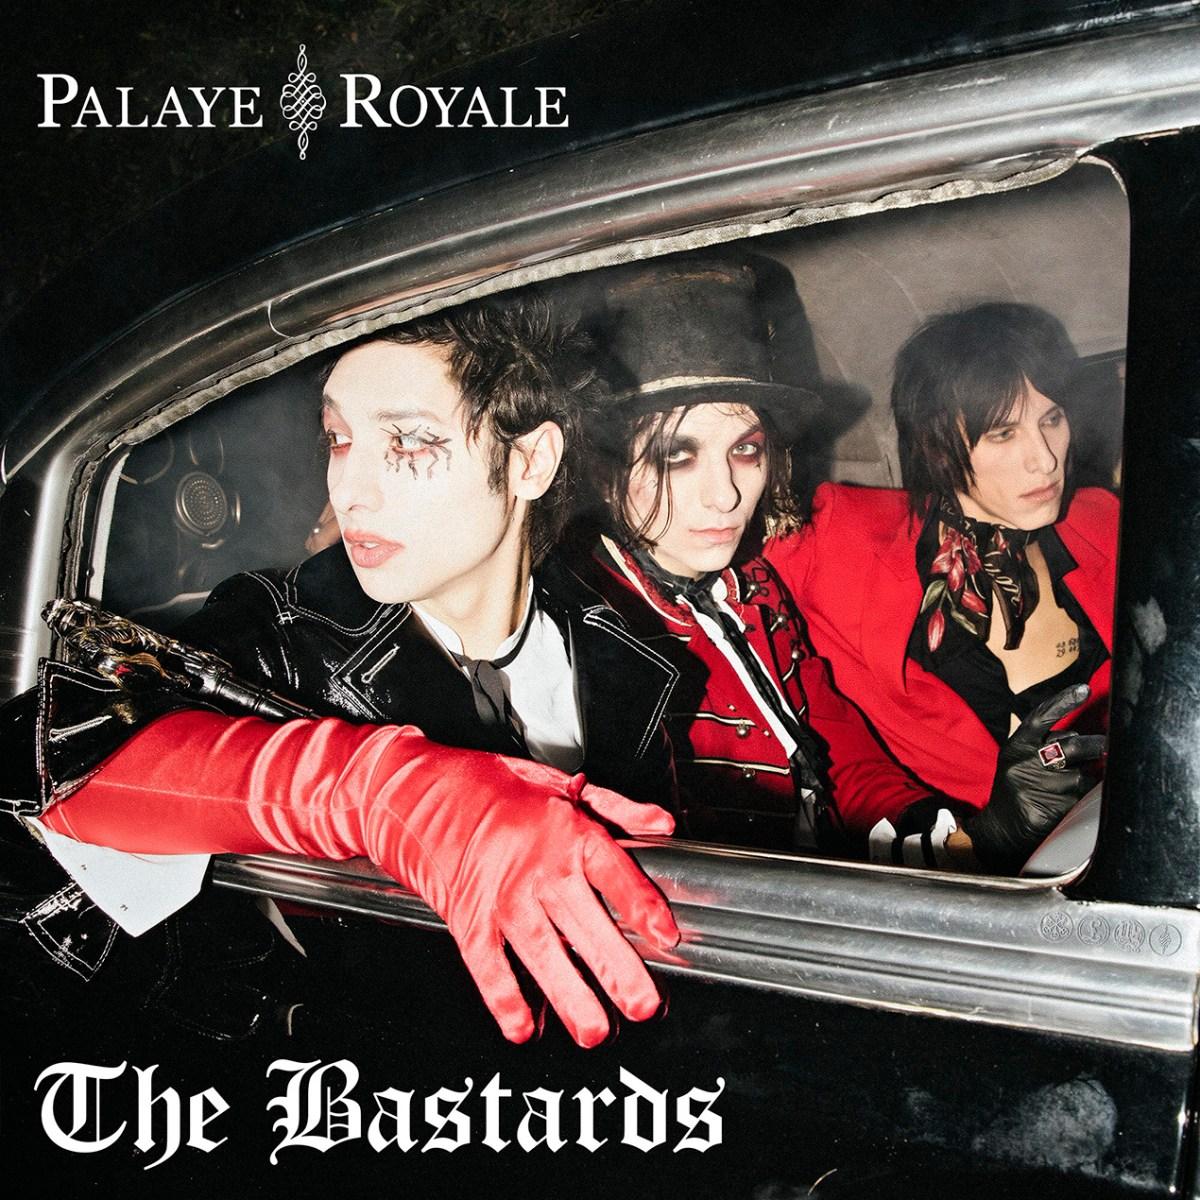 the bastards